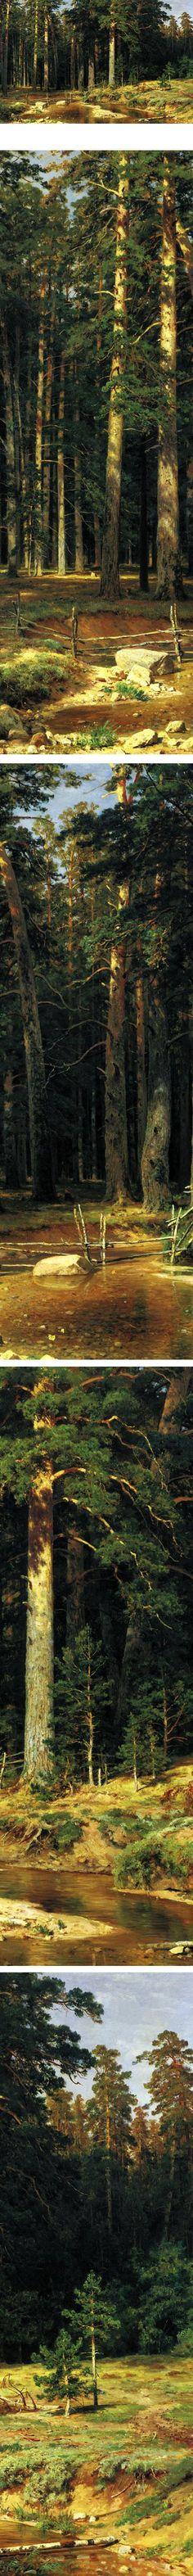 ⚓♡salt air⊰⛵  .    The Mast-tree Grove, Ivan Shishkin